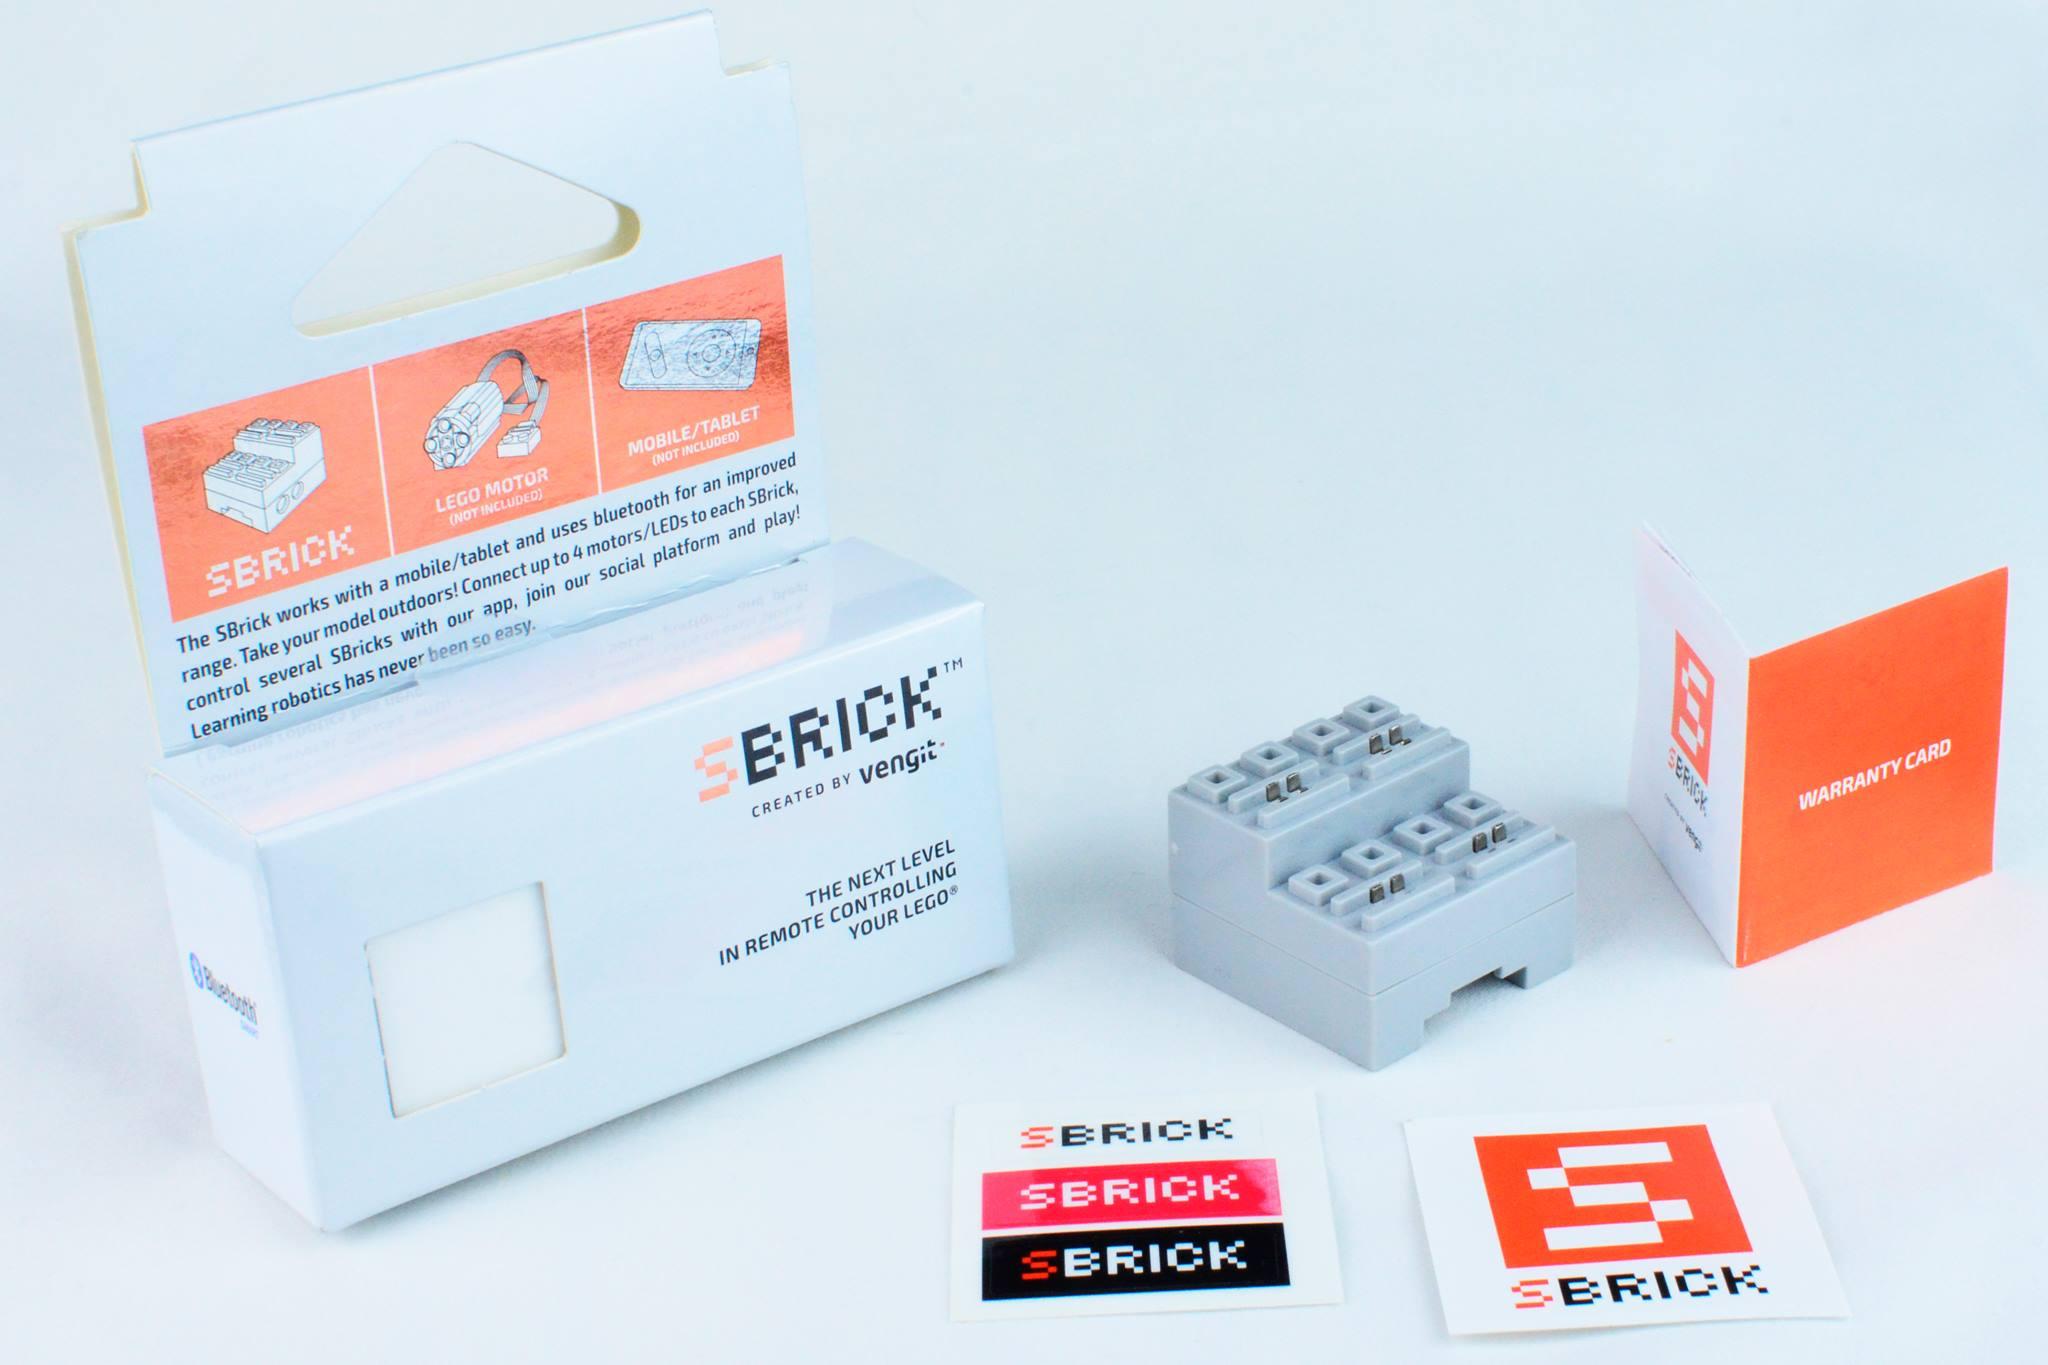 SBrick box